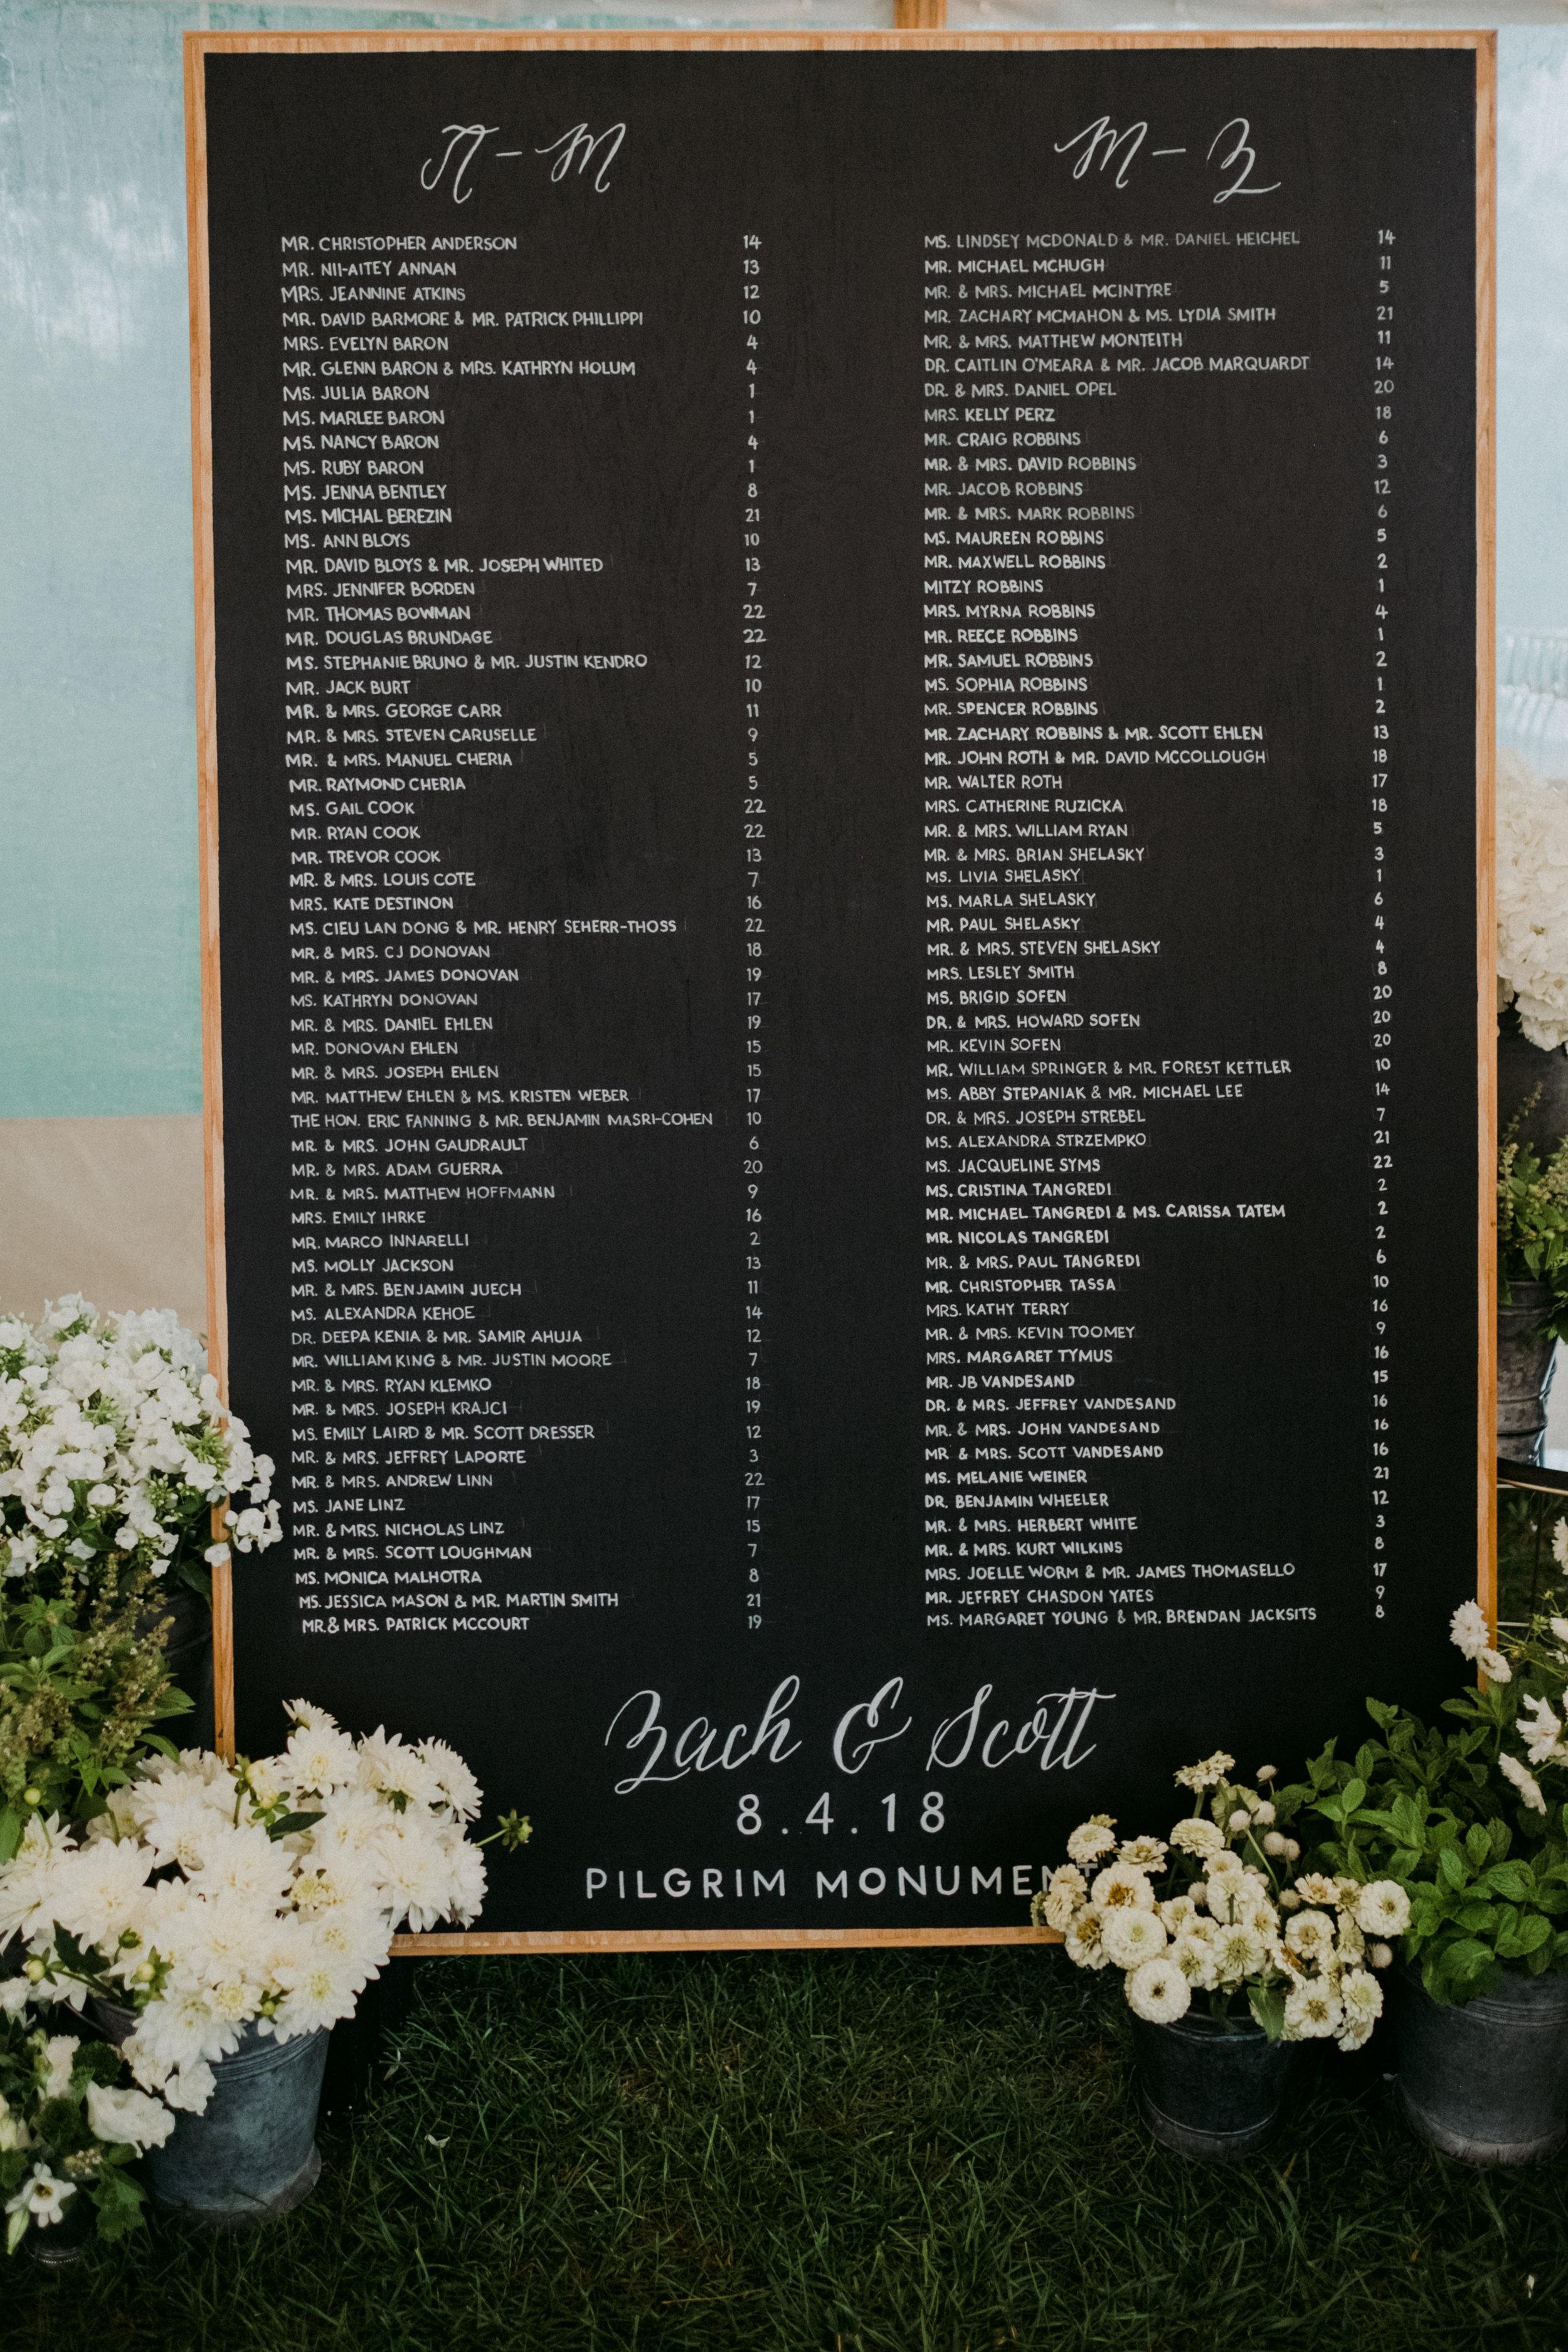 Same Sex Wedding in Provincetown, MA. Destination wedding planned by Nicole Simeral. Coastal Chic Wedding, Travel Wedding, Sperry Sailcloth Tent Wedding, escort card, seating chart, seating board